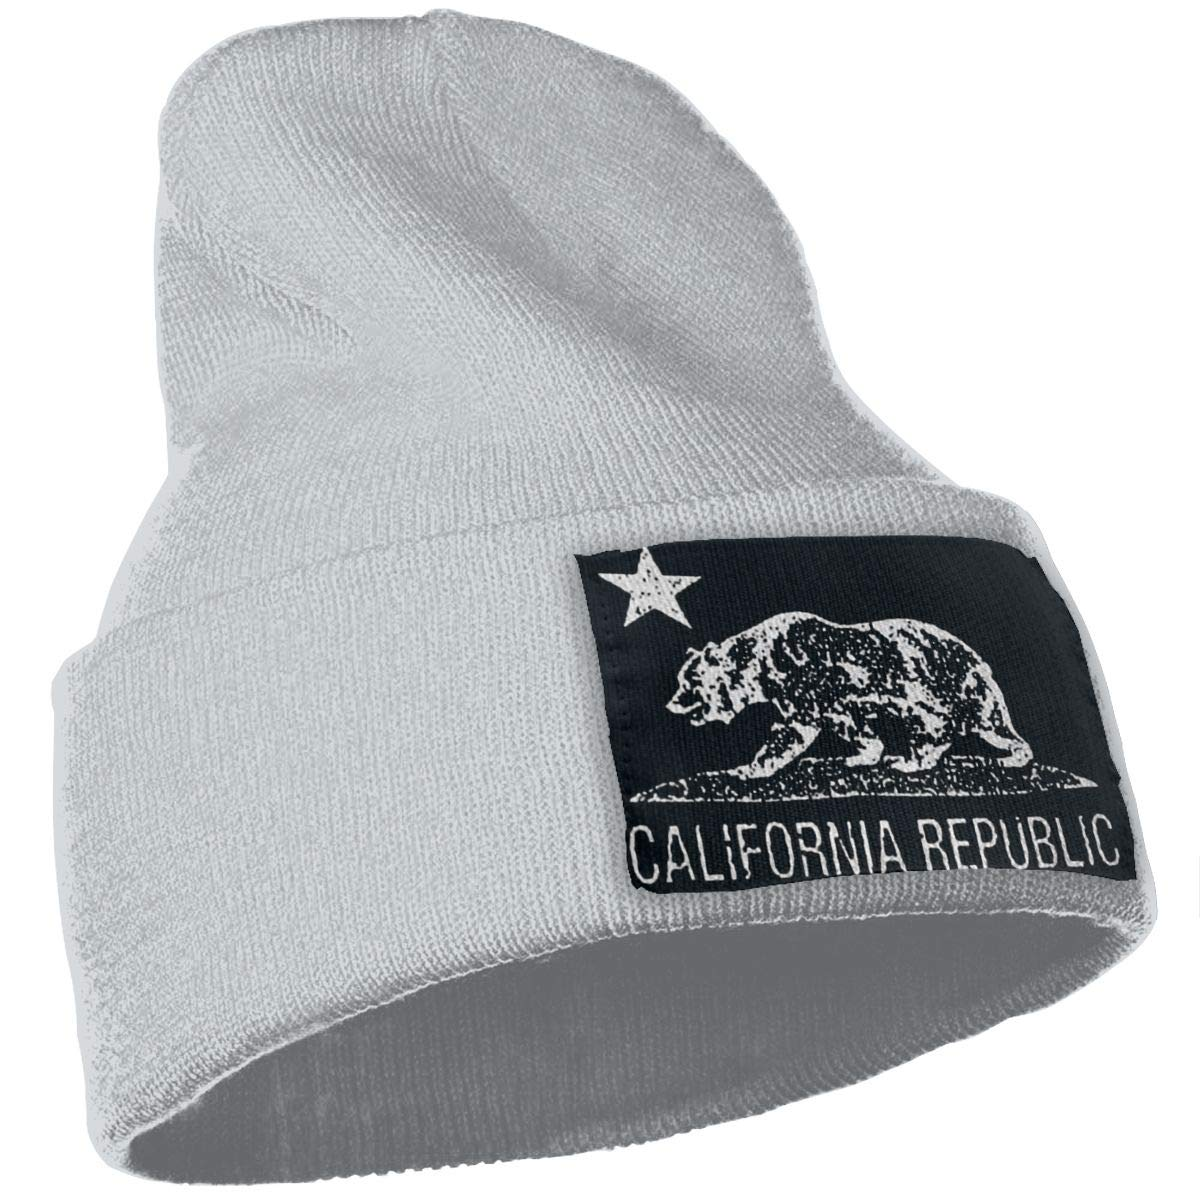 JimHappy California Bear Winter Warm Hats,Knit Slouchy Thick Skull Cap Black